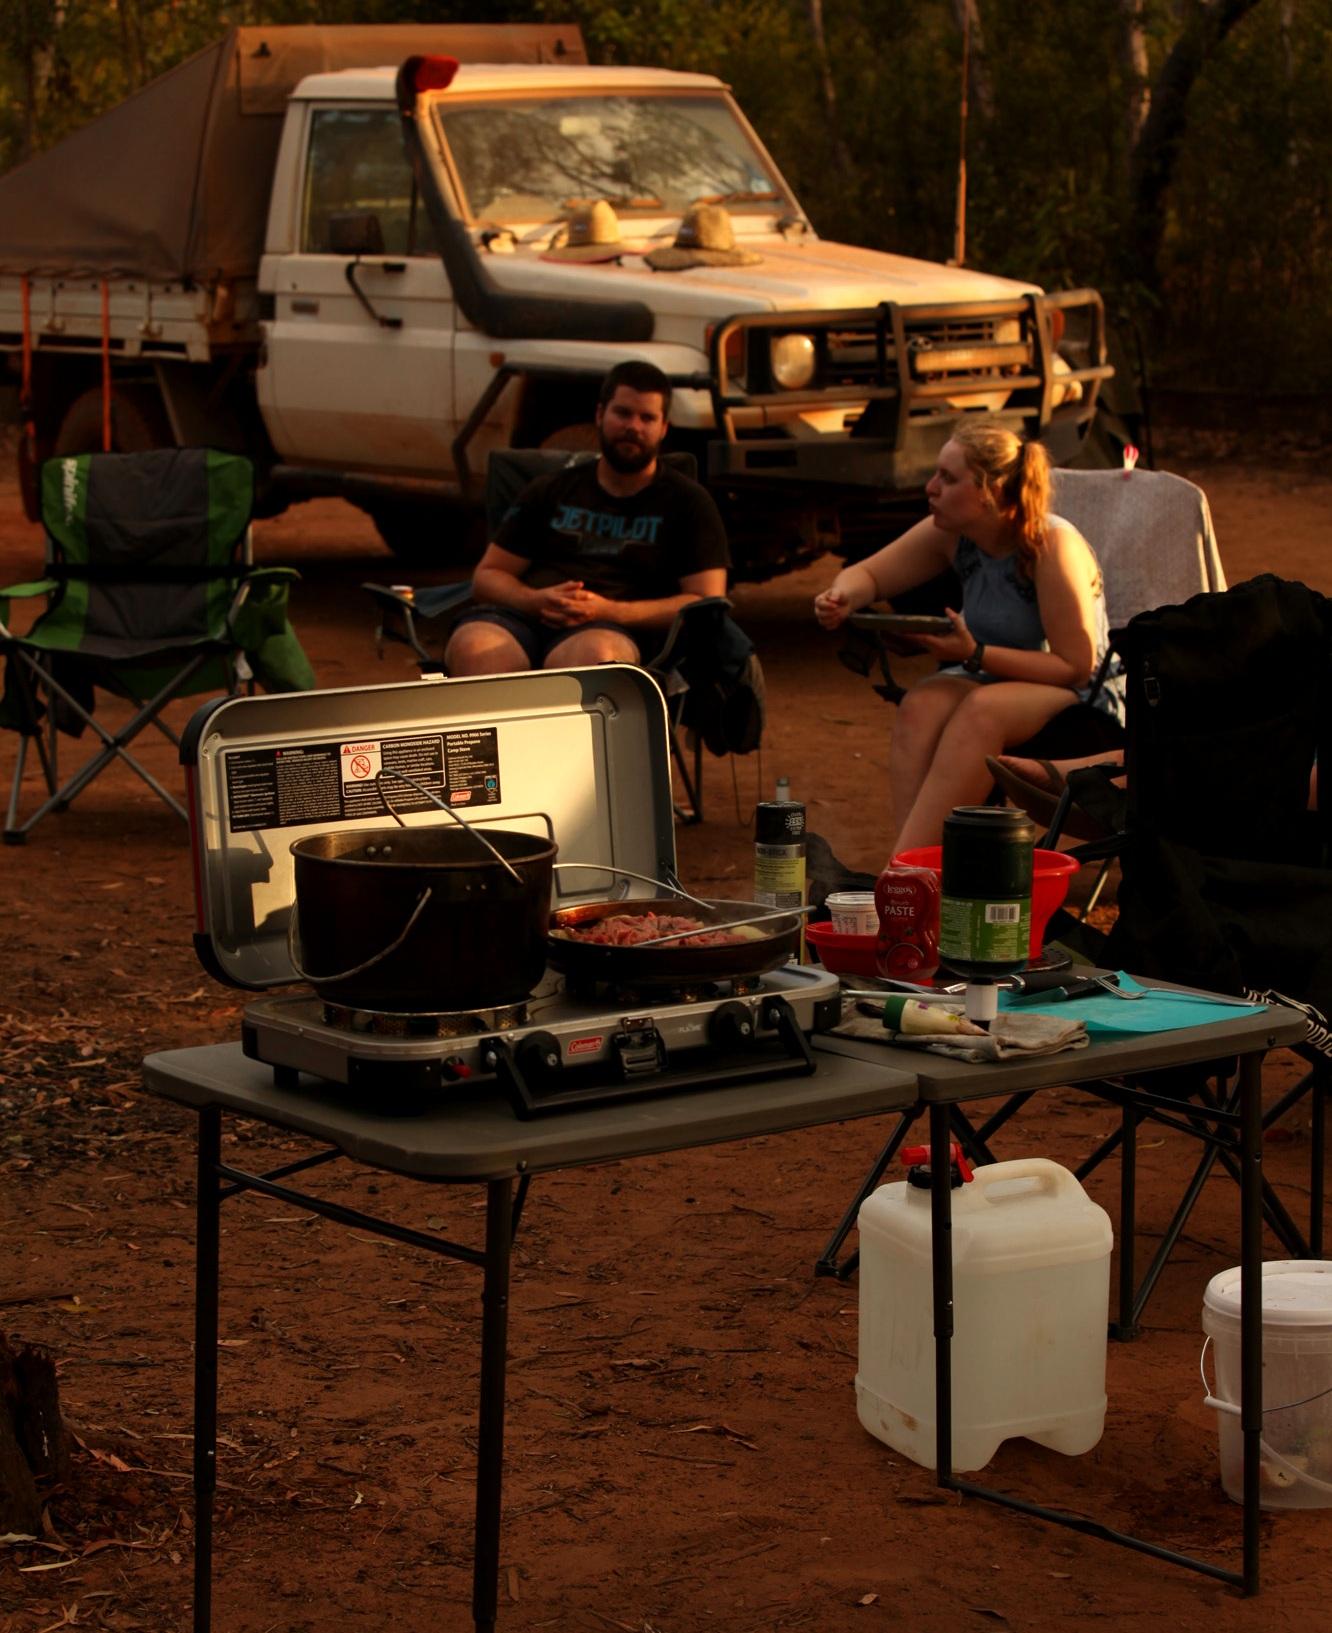 Evening camp kitchen setup.